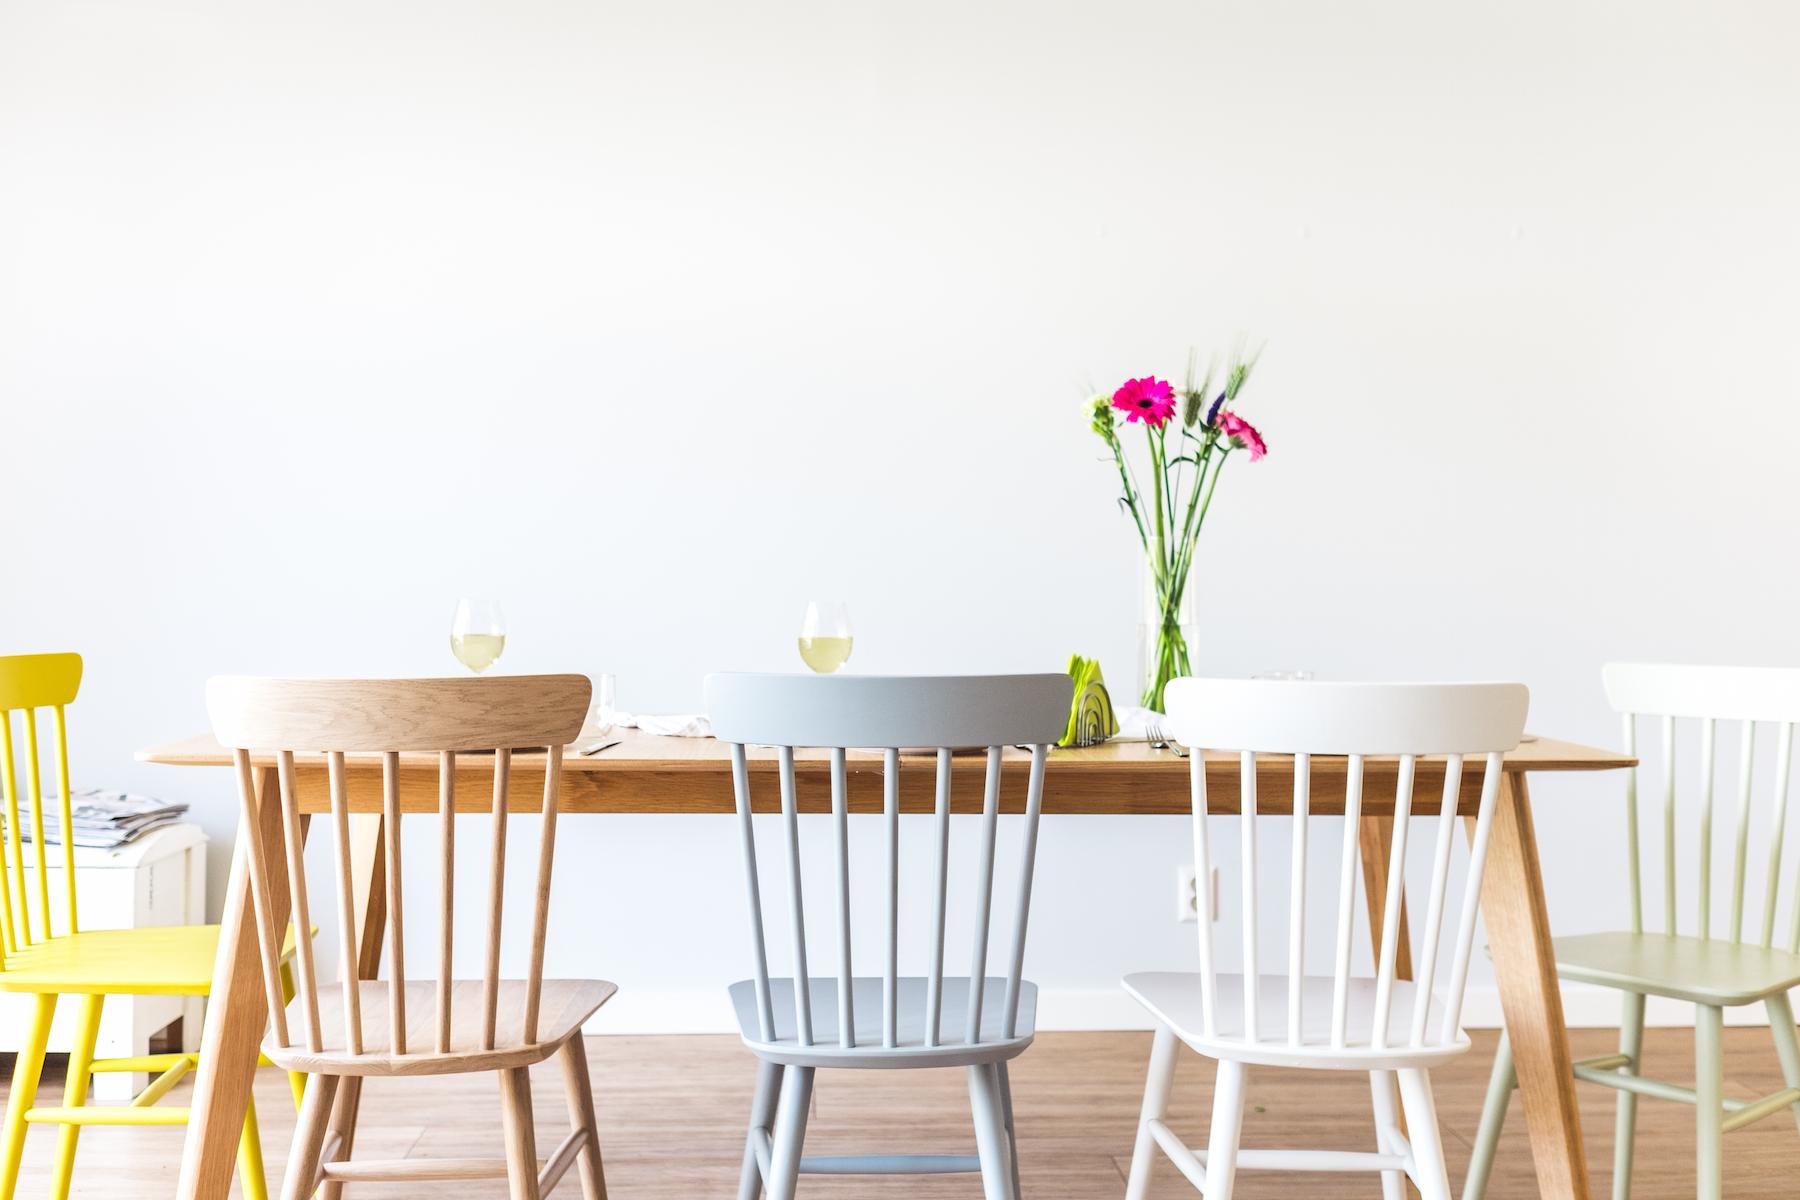 Home interior design accessories pippa  houten spijlenstoel   home decor   pinterest  home